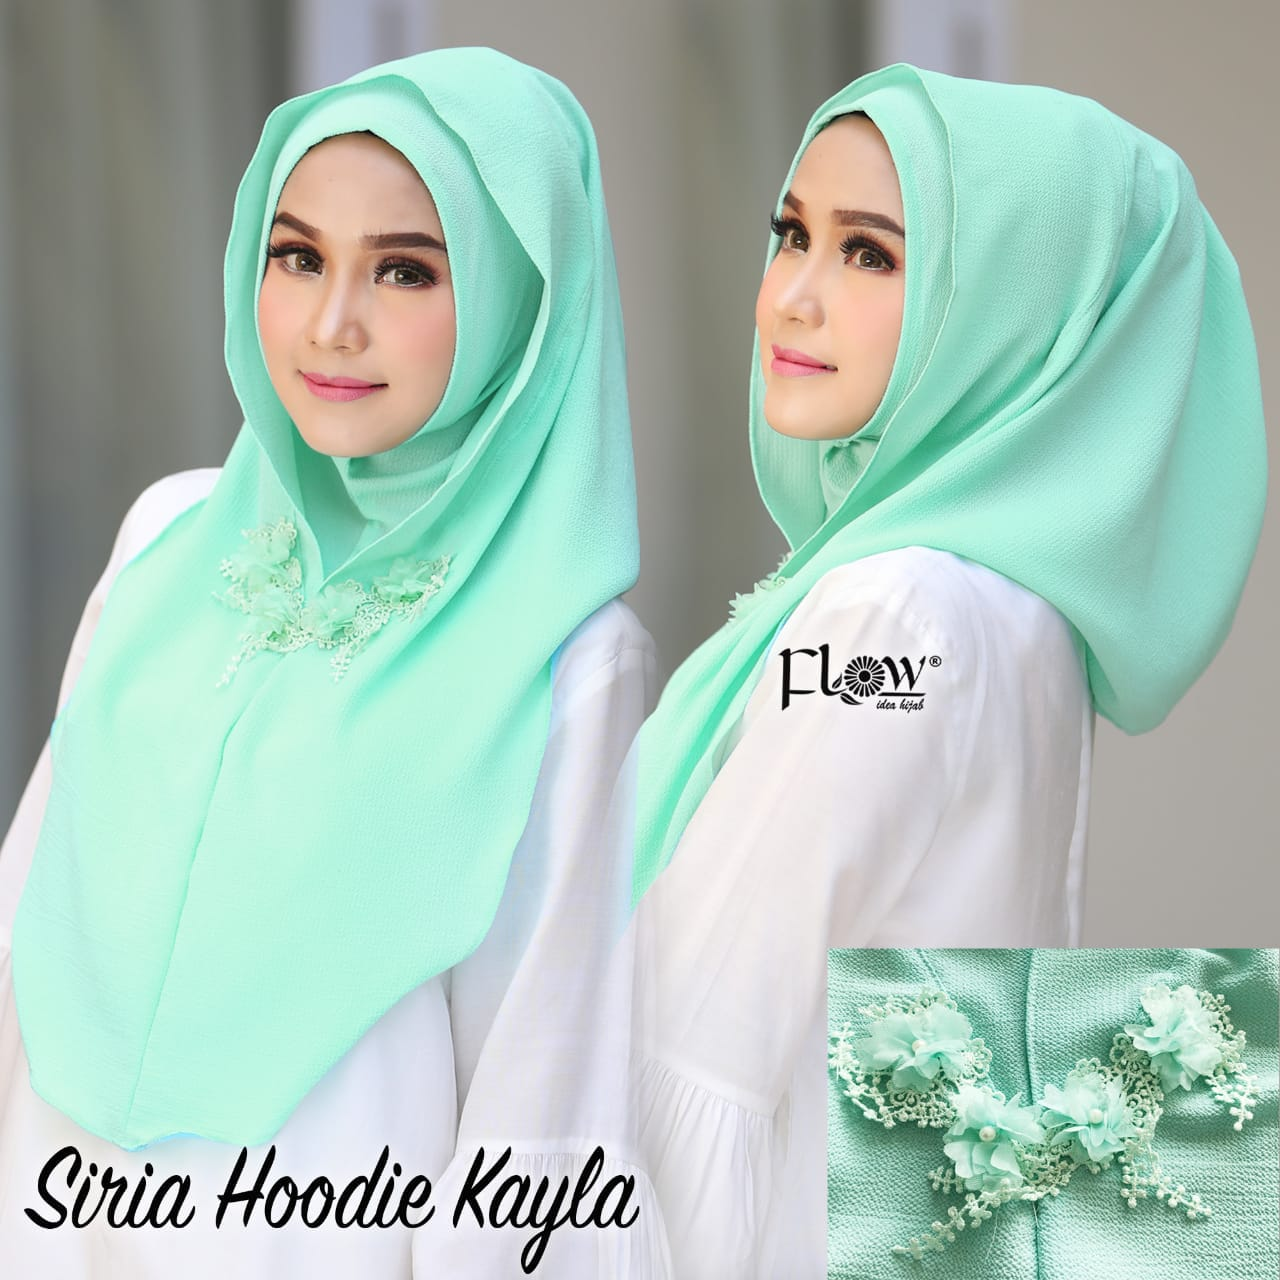 Buy Instant hoodie hijab Online from Hiba Hijab. Online Shopping Website Pakistan | www.sastidukan.com